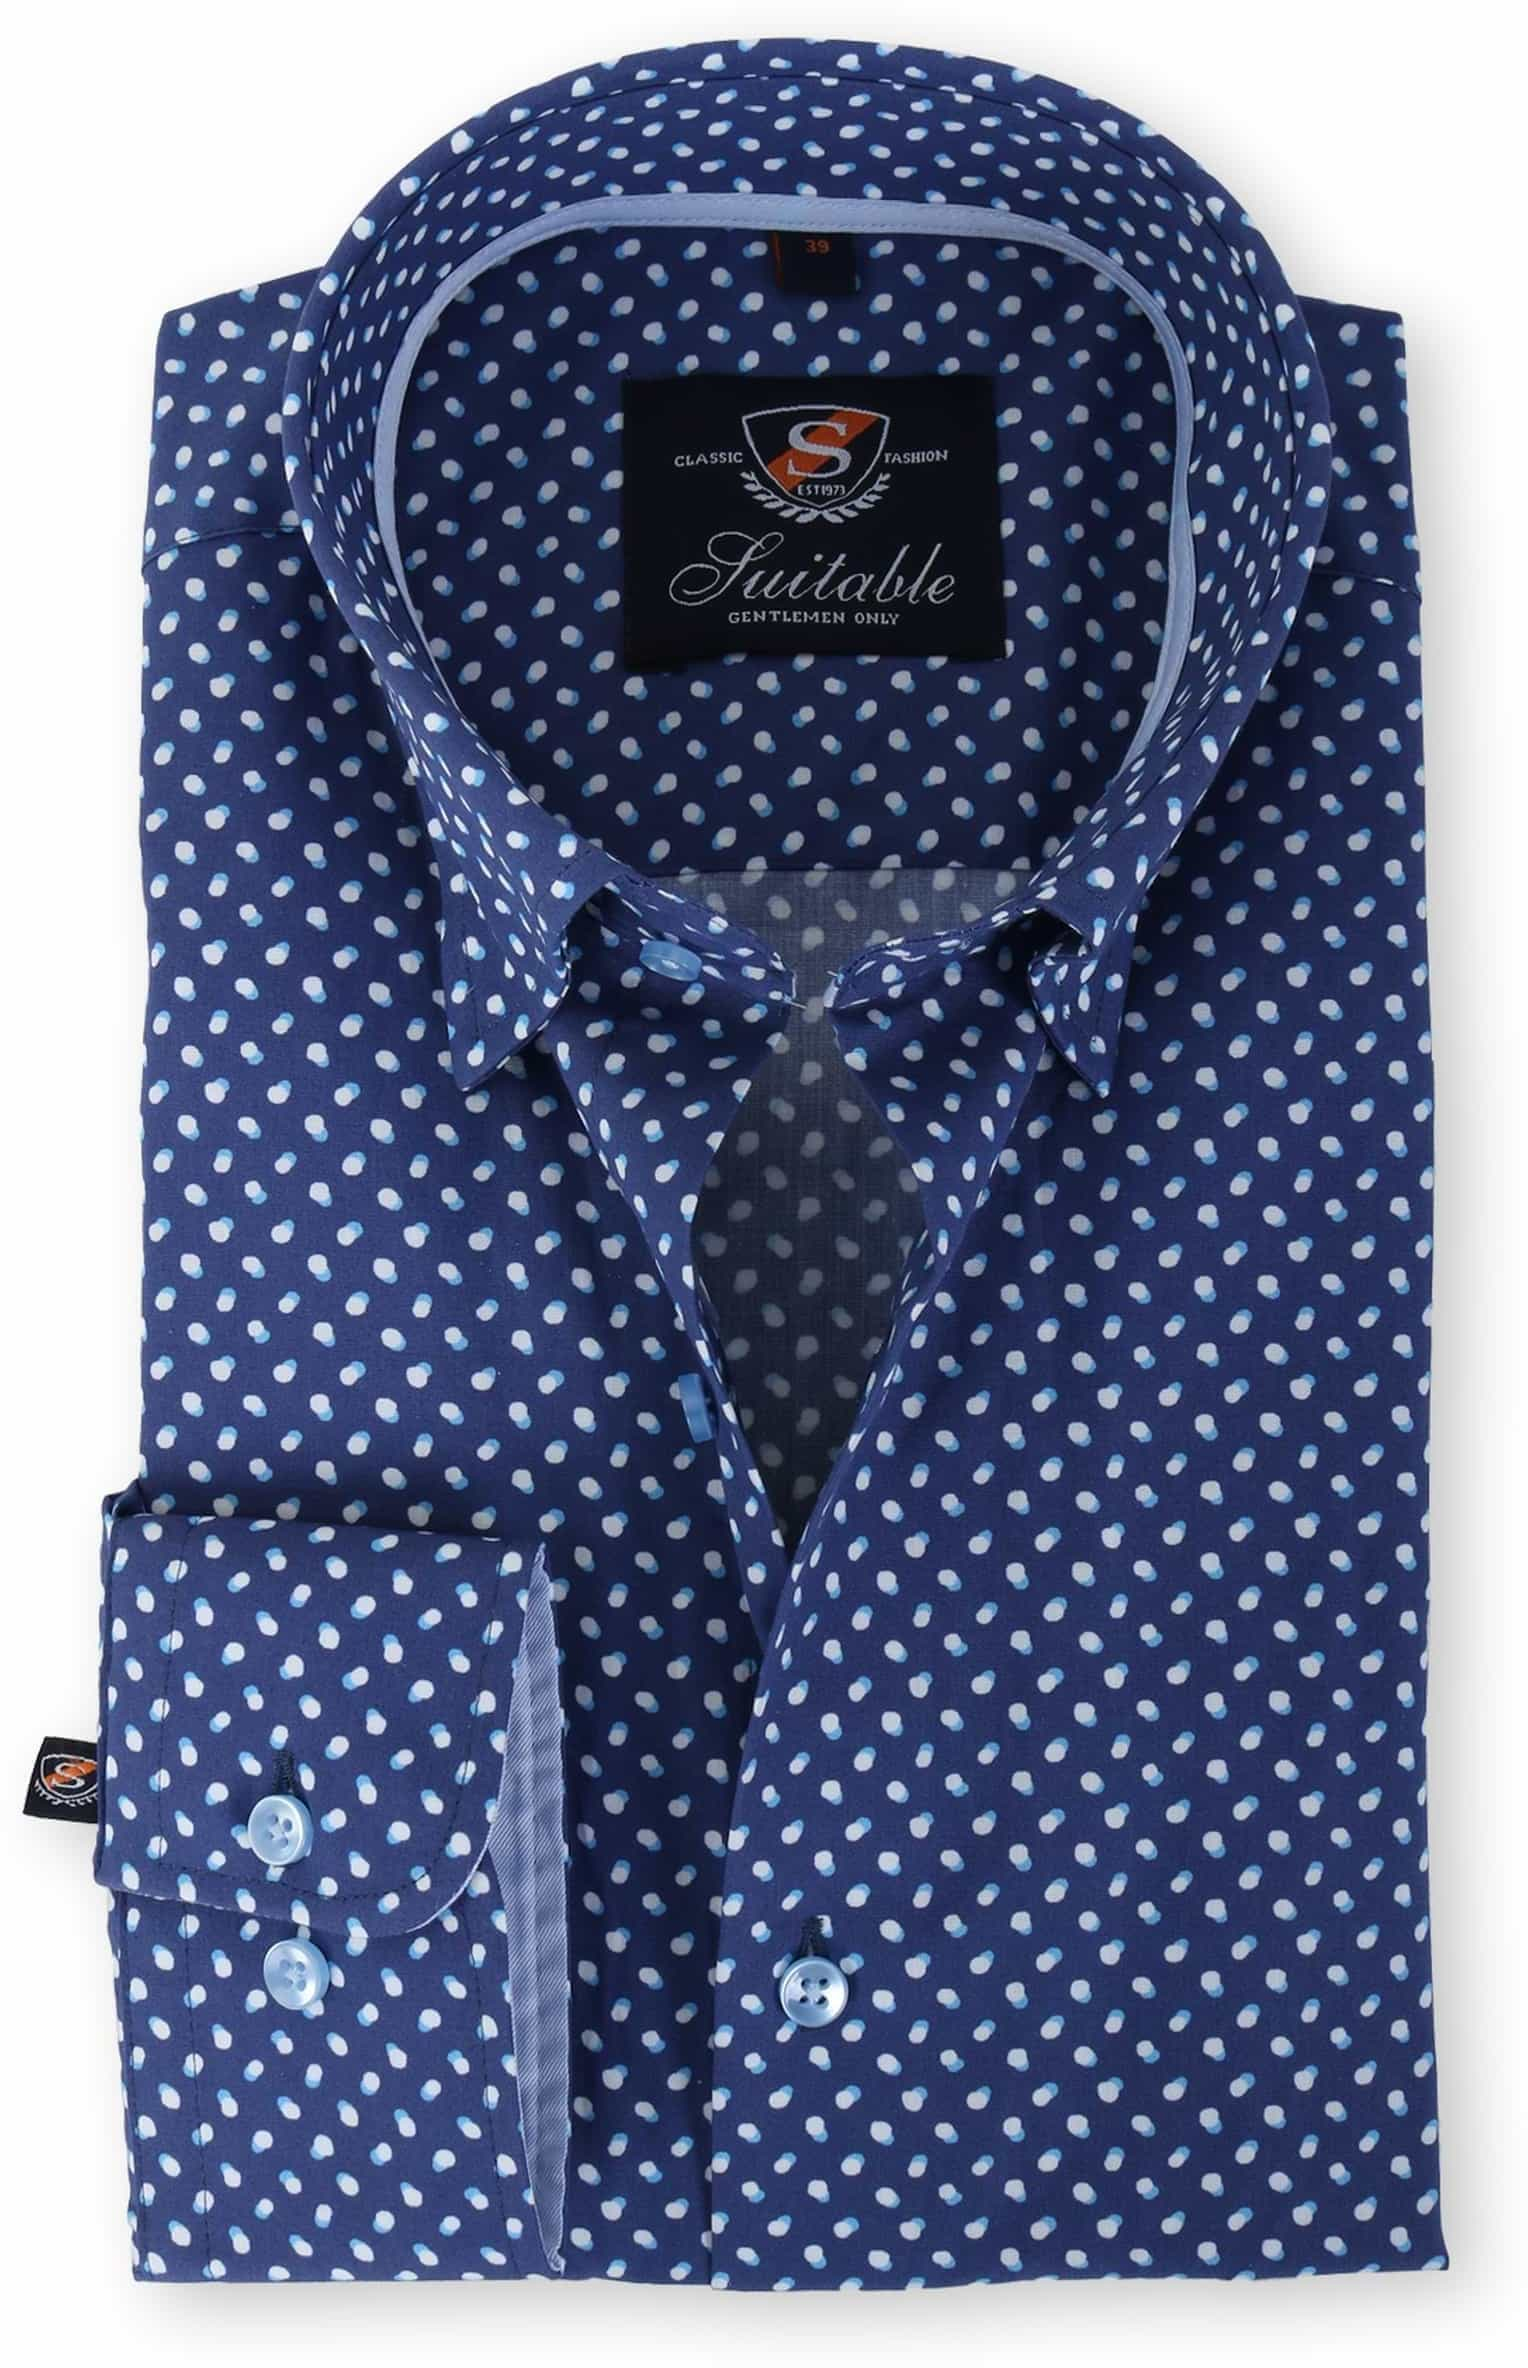 Suitable Overhemd Blauw Print 133-3 foto 0